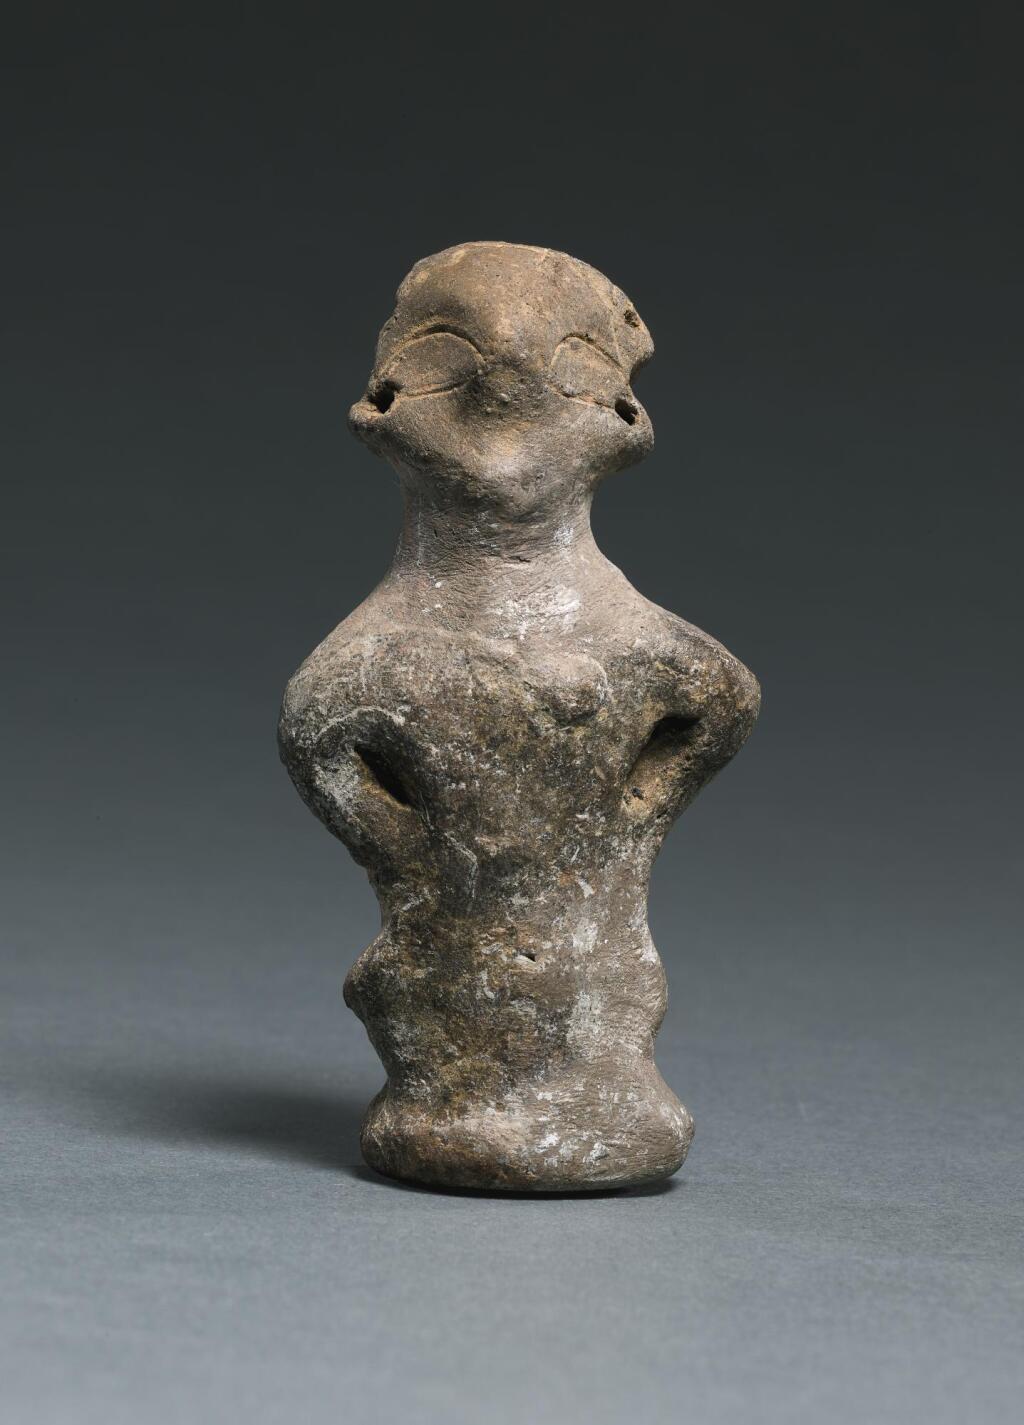 A VINČA TERRACOTTA FIGURE OF A WOMAN, NEOLITHIC PERIOD, VINČA C-D, VINČA-PLOČNIK-PHASE I, 5000-4500 B.C.